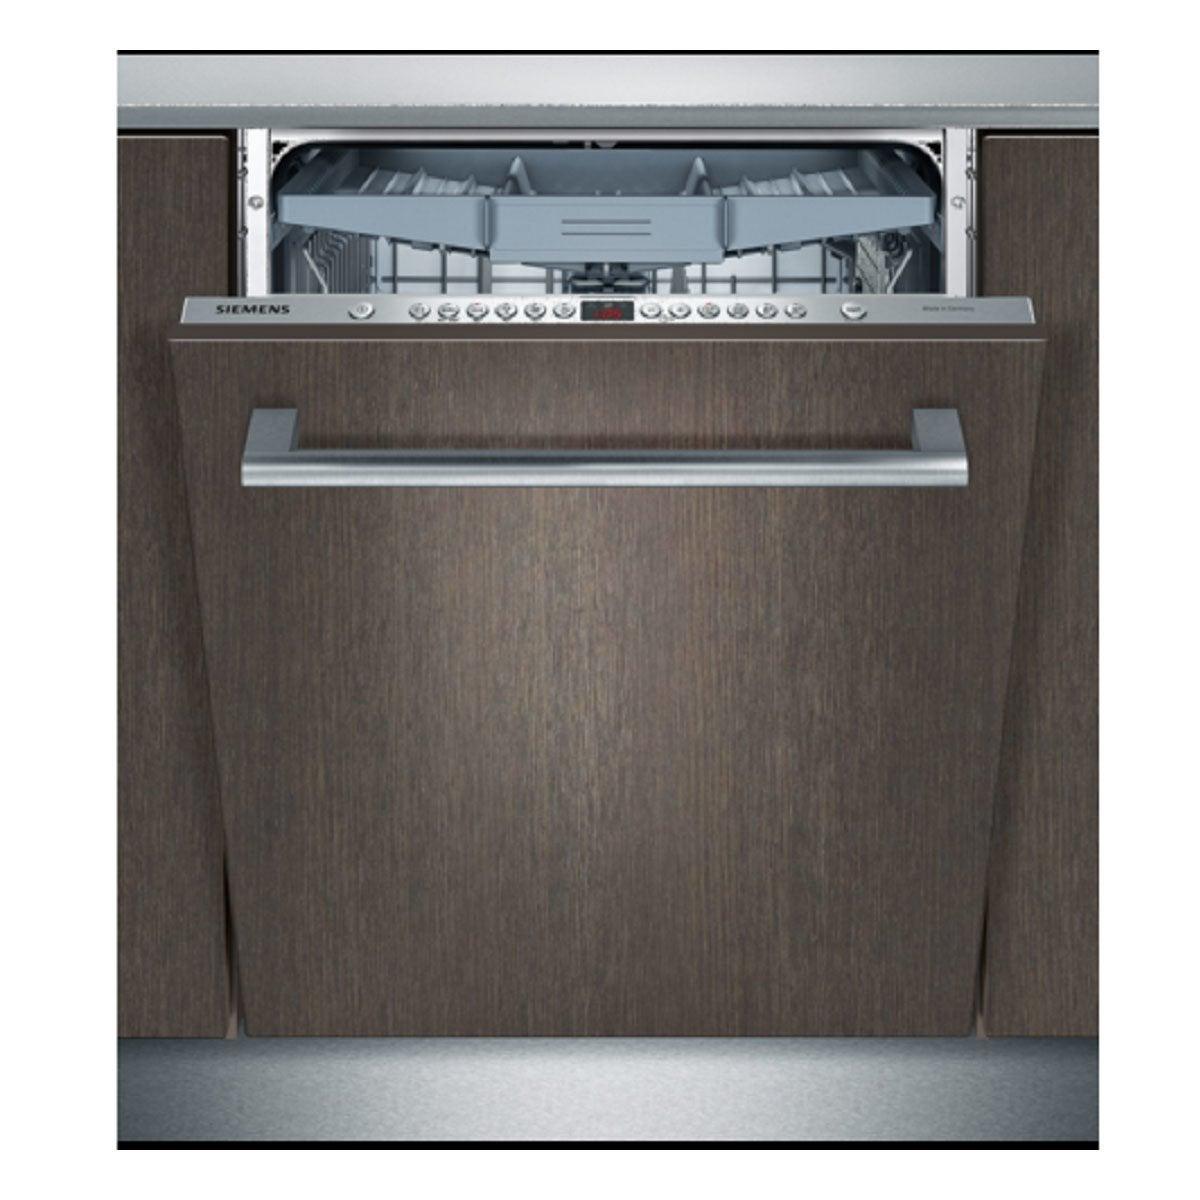 Siemens SN66M080AU Dishwasher